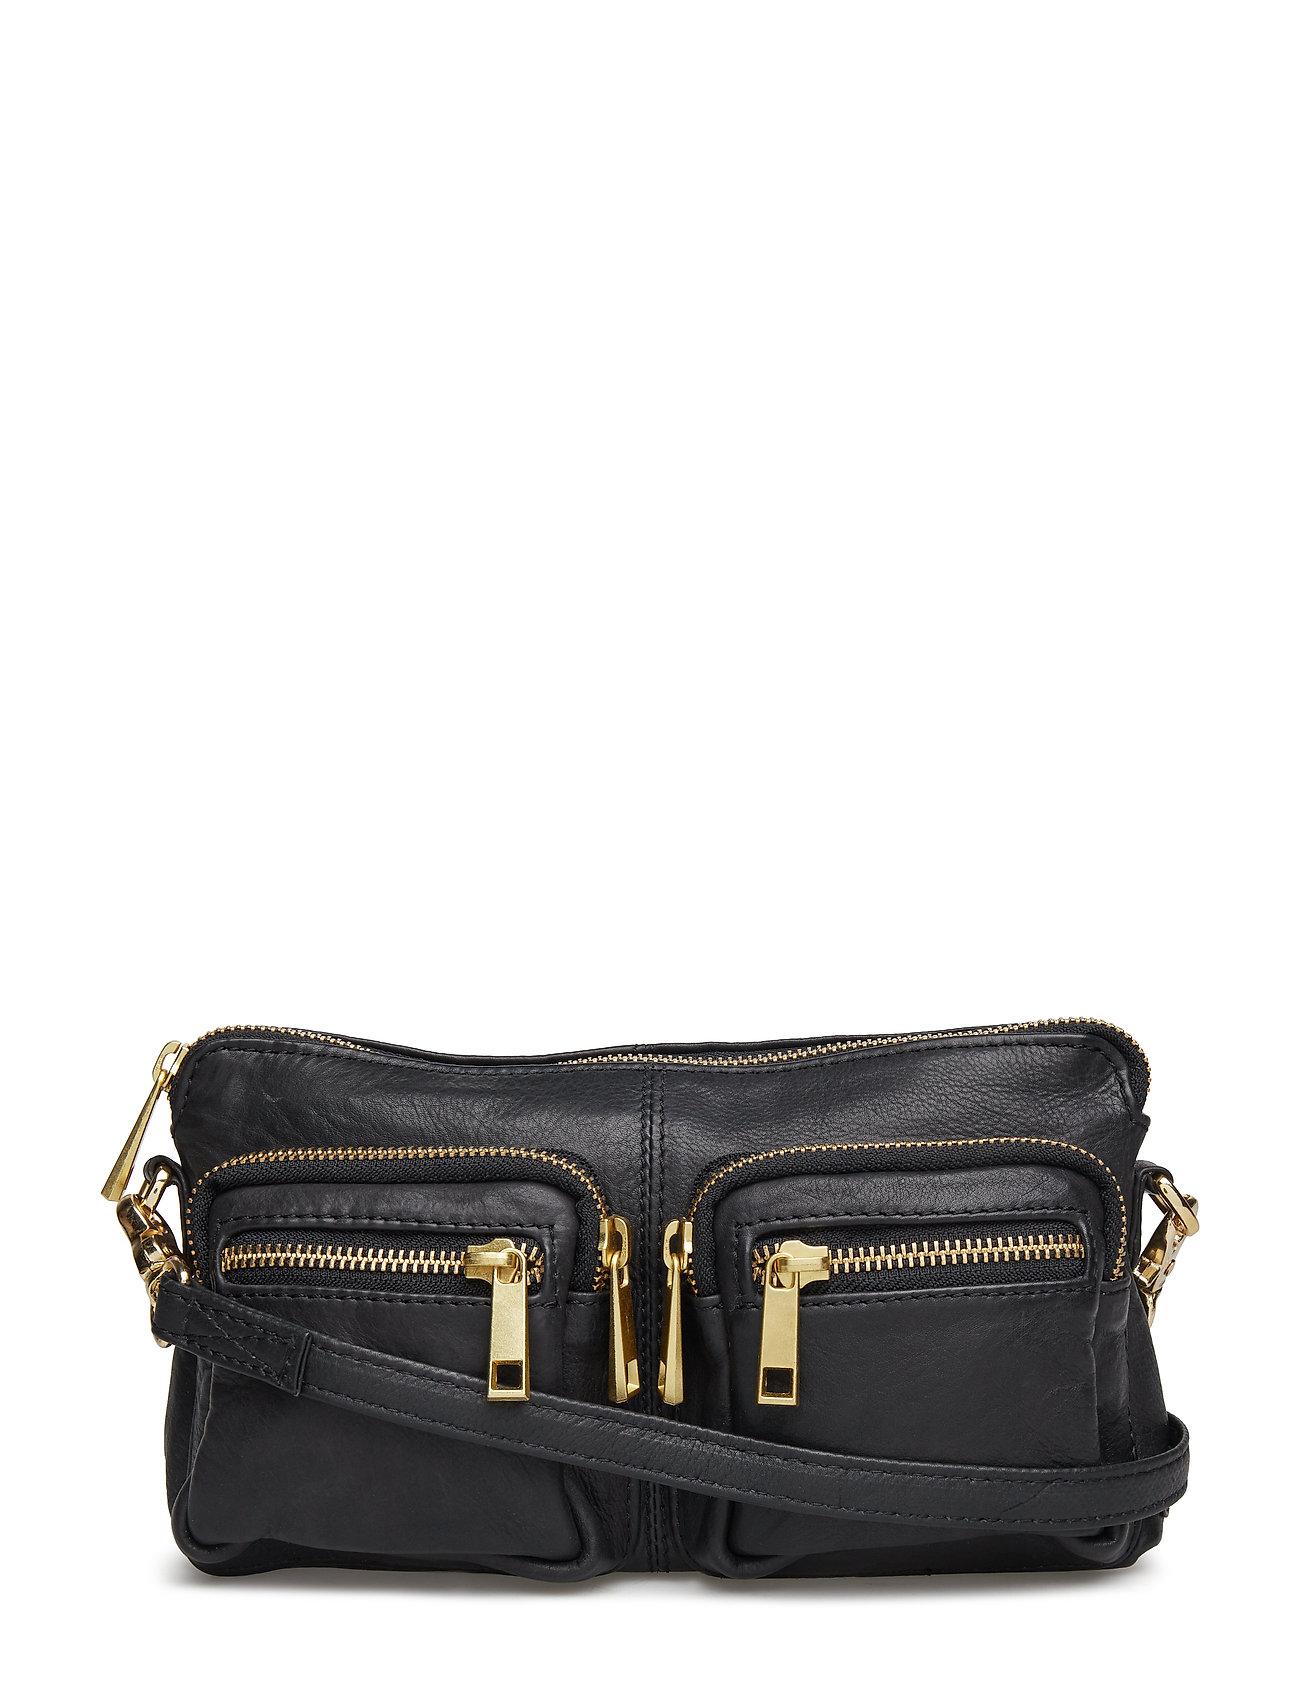 DEPECHE Small bag / Clutch - BLACK